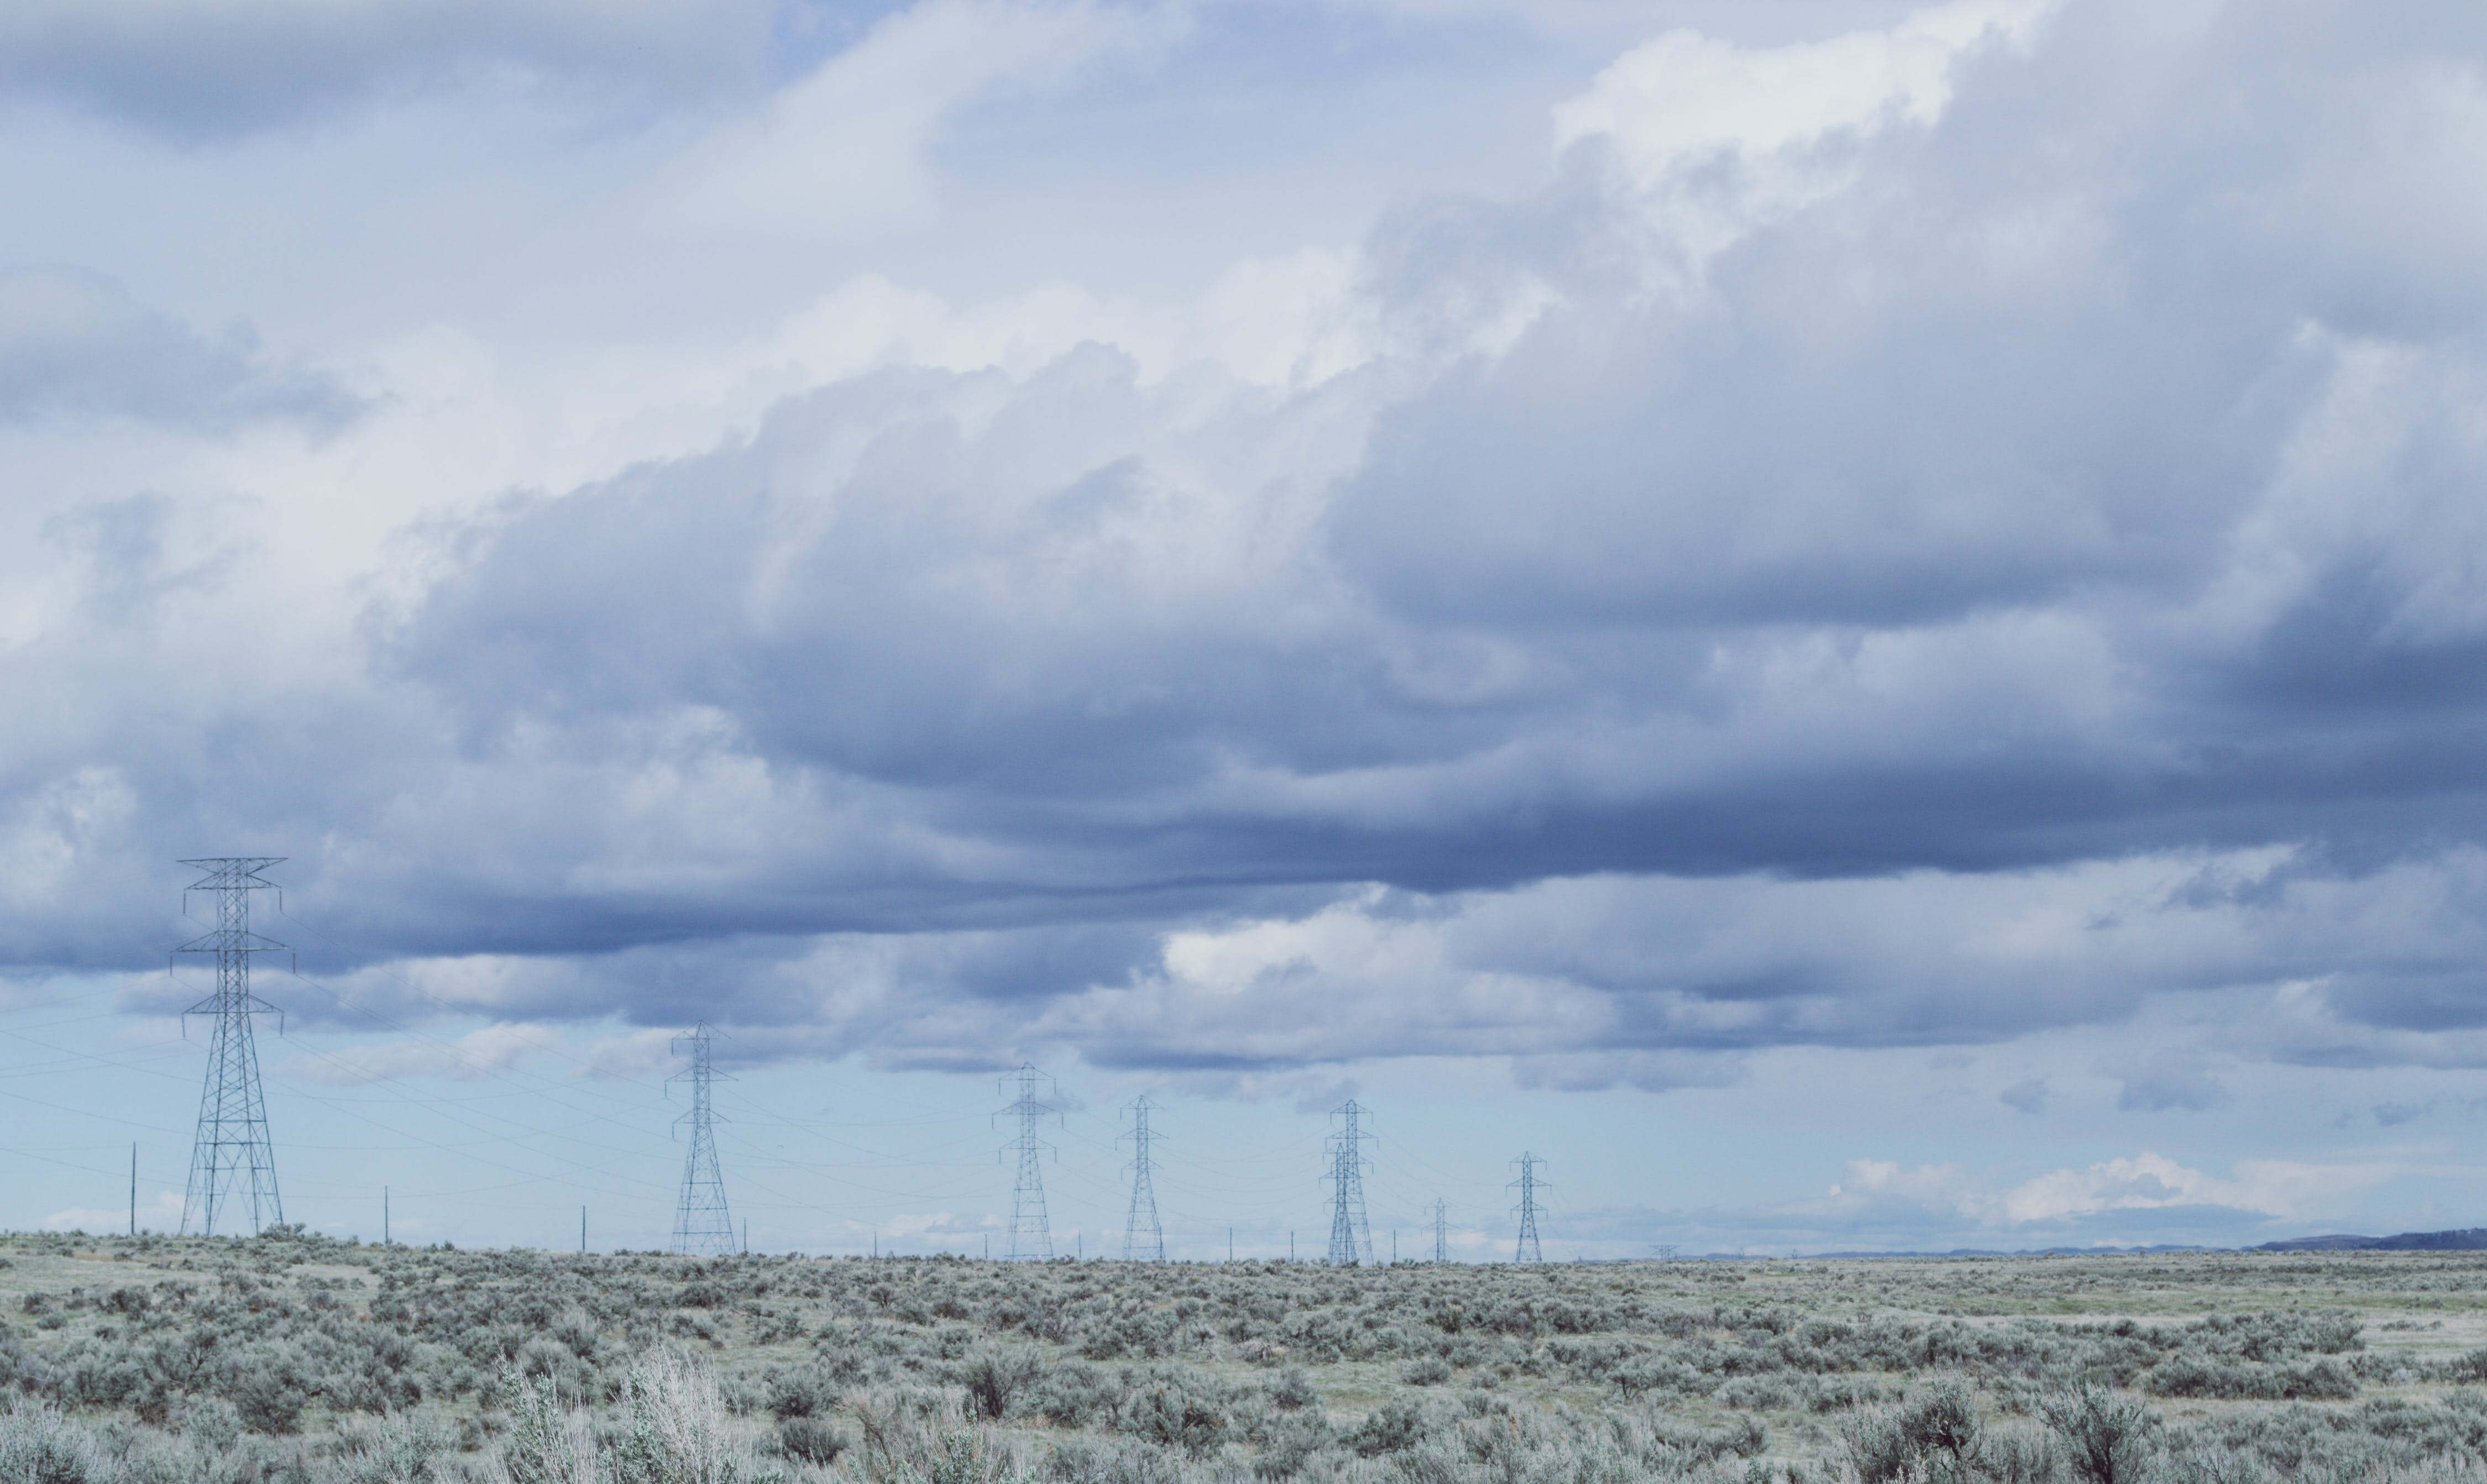 Бесплатное стоковое фото с голубое небо, линии электропередачи, небо, облака